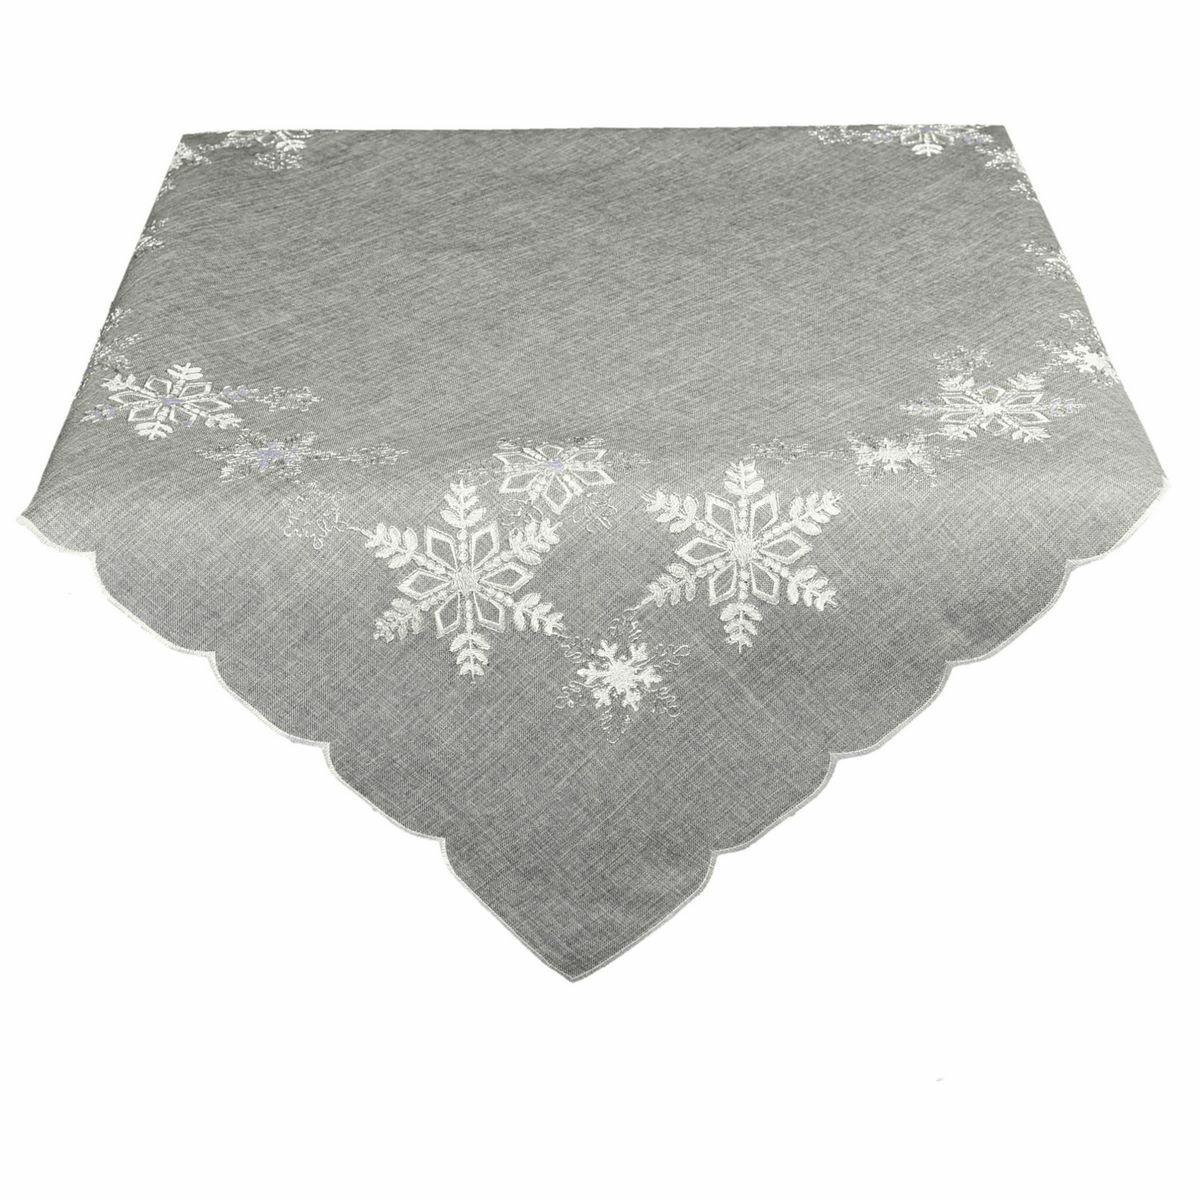 BO-MA Trading Vánoční ubrus Vločky šedá, 120 x 140 cm